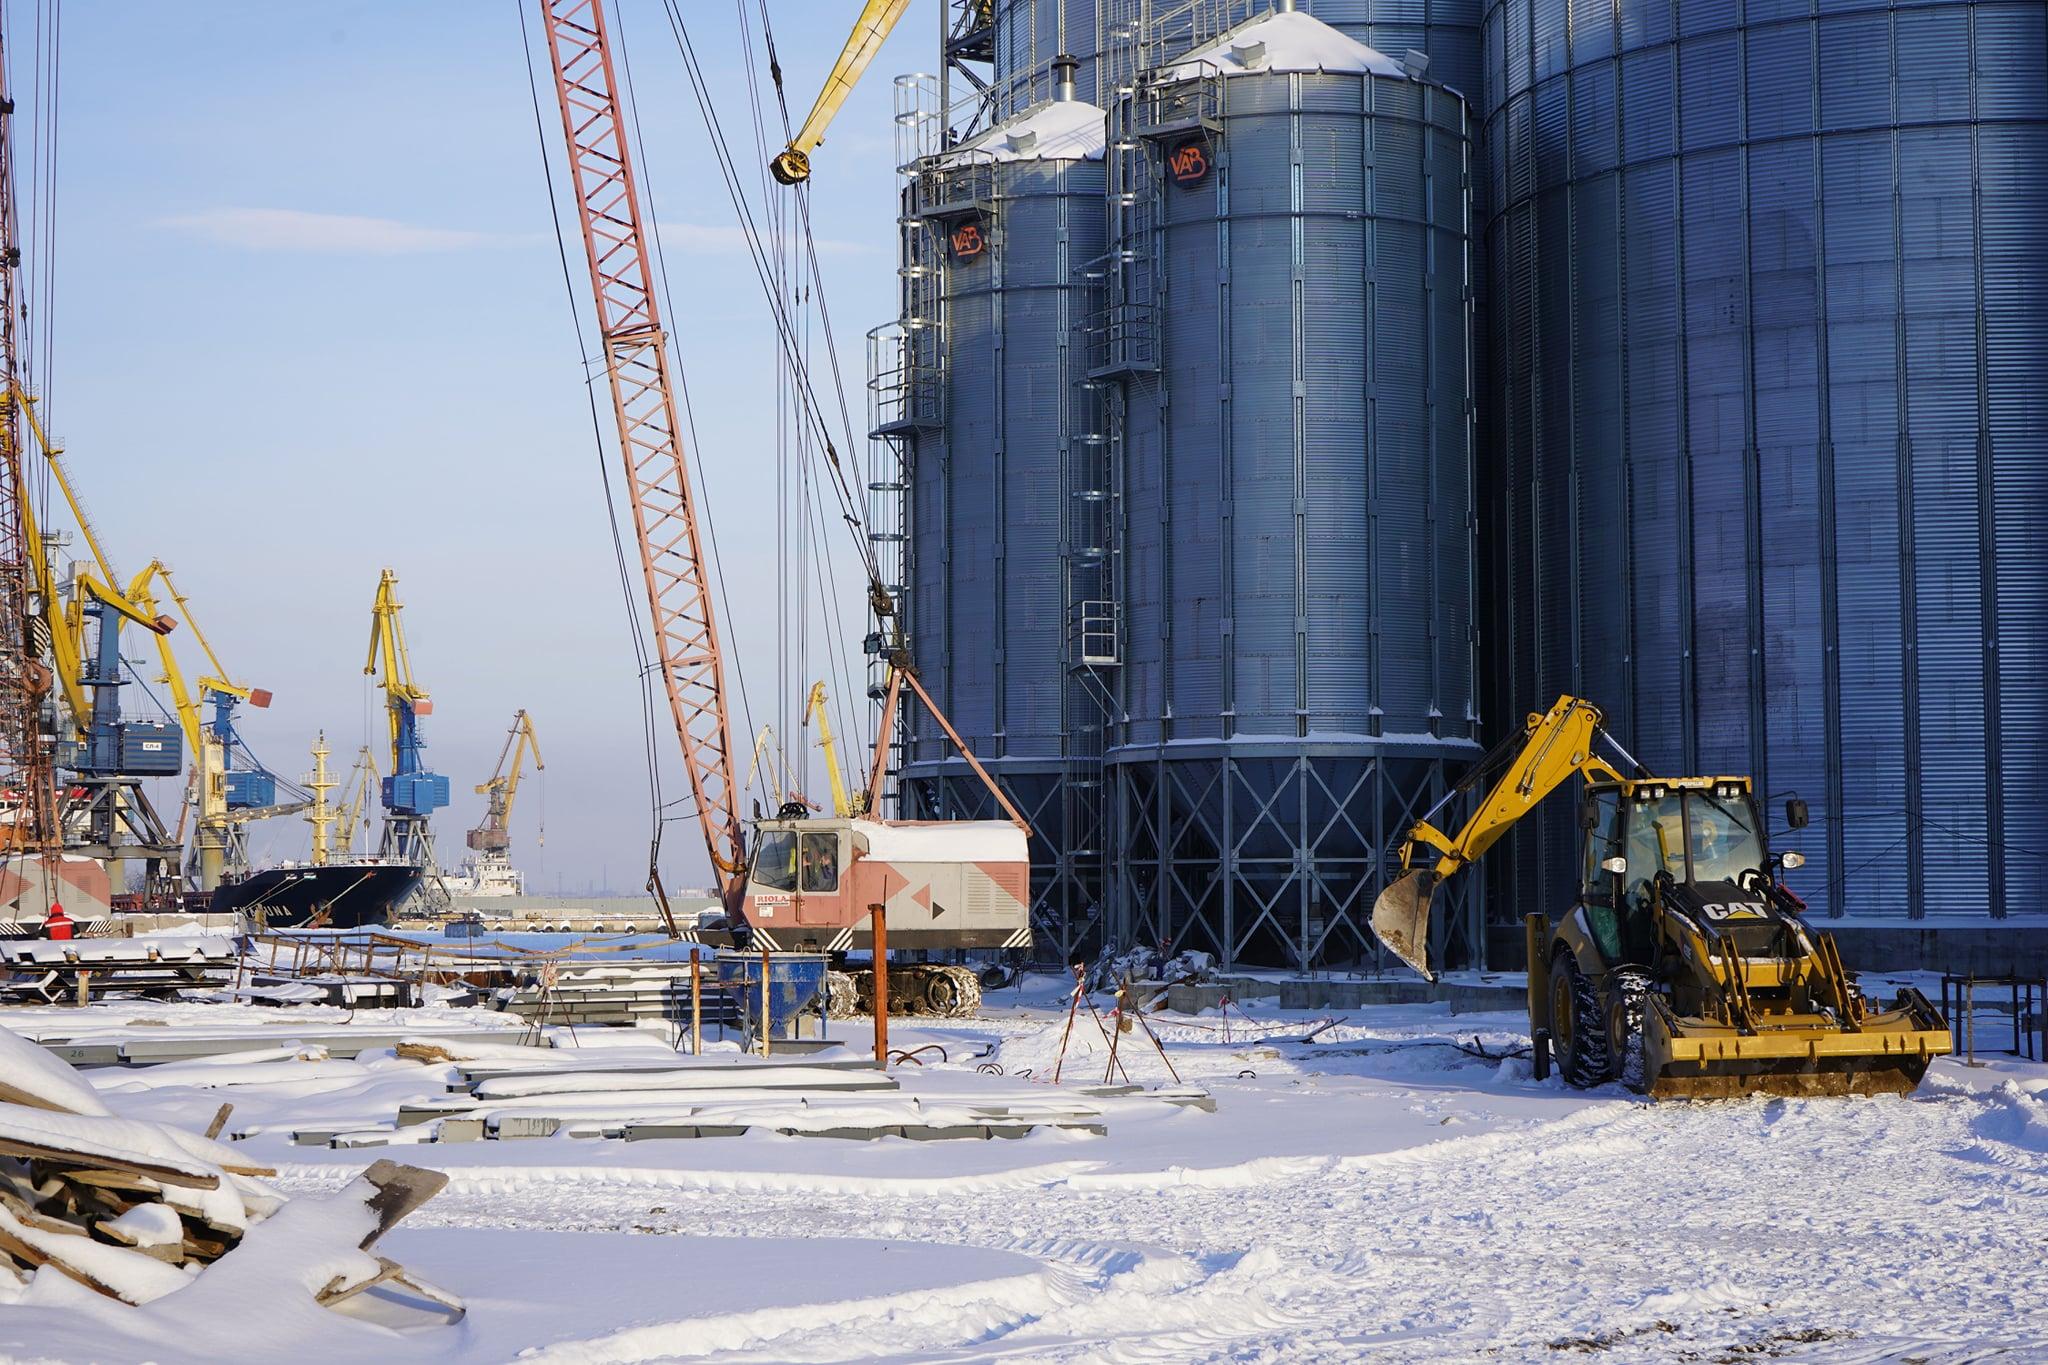 В Маріупольському порту будівництво зернового комплексу завершать до початку сезону